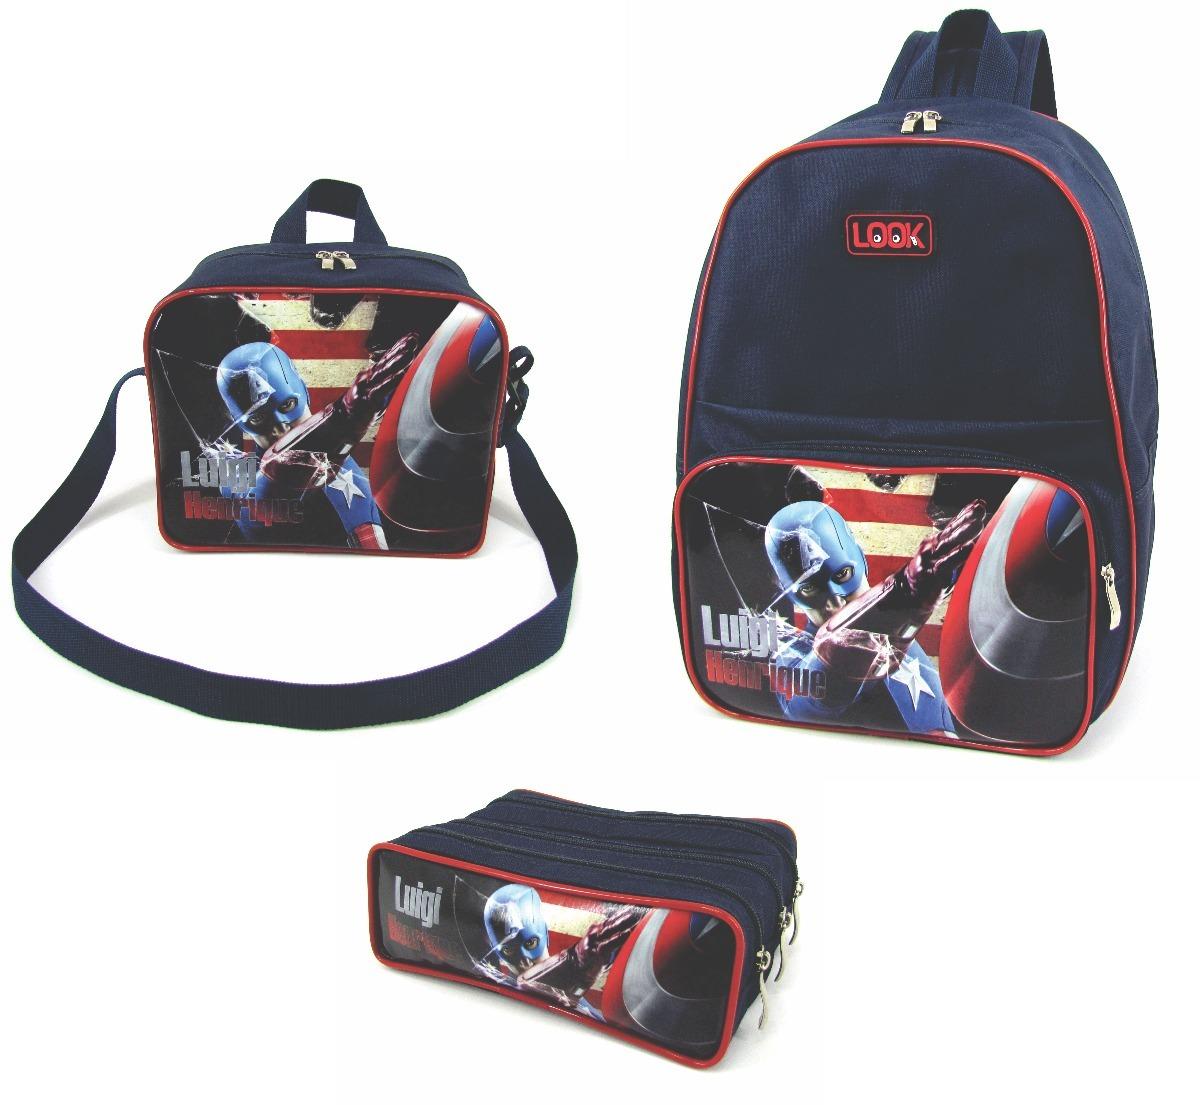 2ce8d0484 kit escolar personalizado mochila + lancheira + estojo. Carregando zoom.